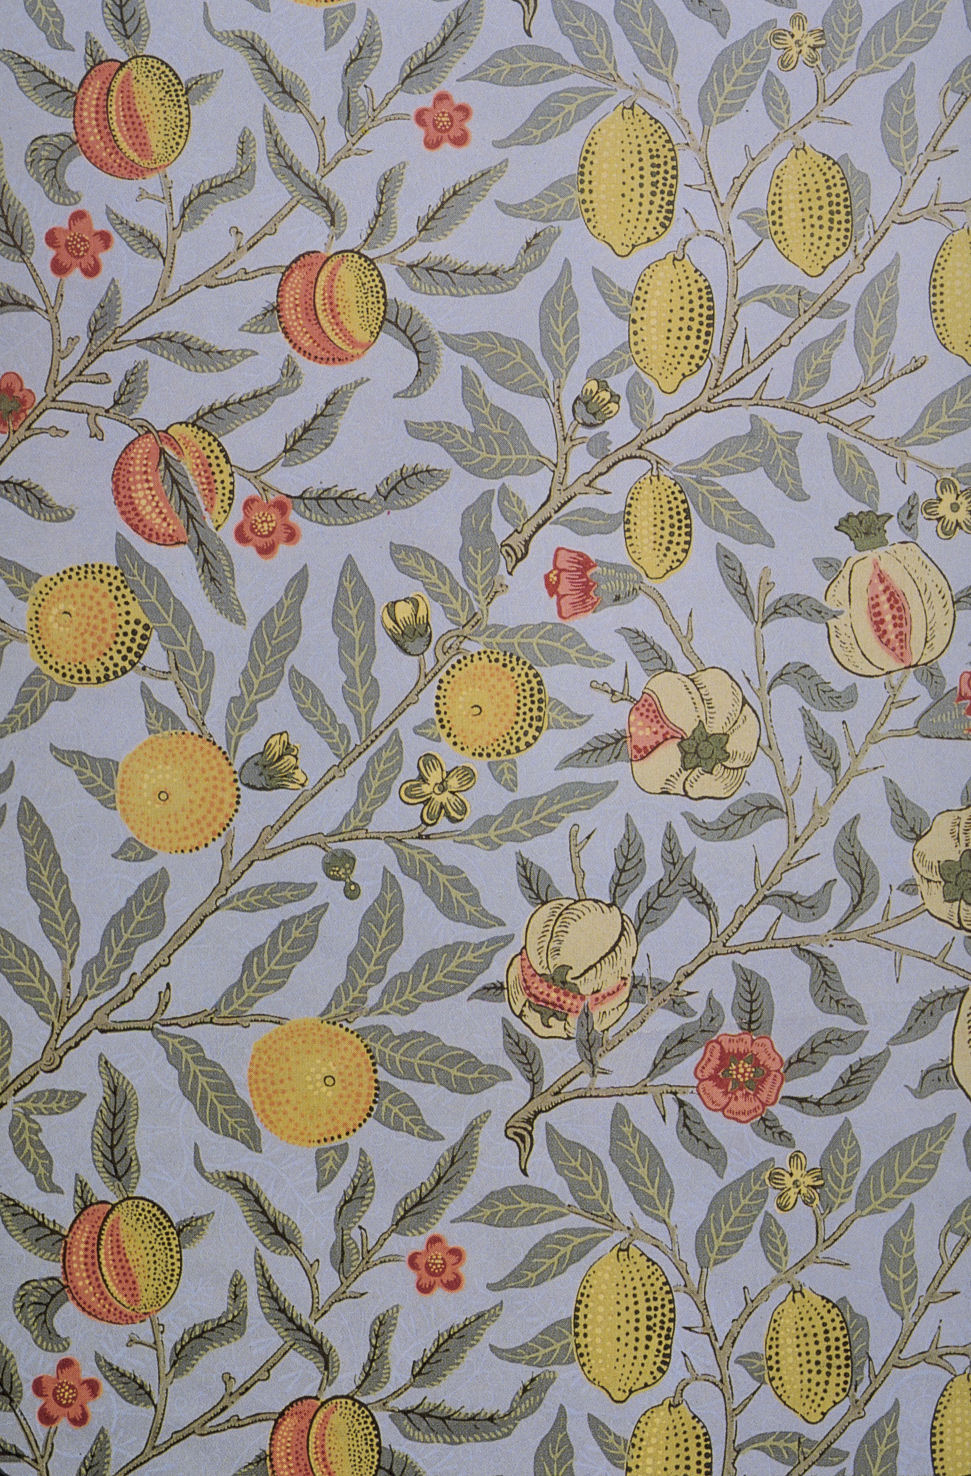 Vintage Ephemera Fruit or Pomegranate wallpaper designed by William 971x1476